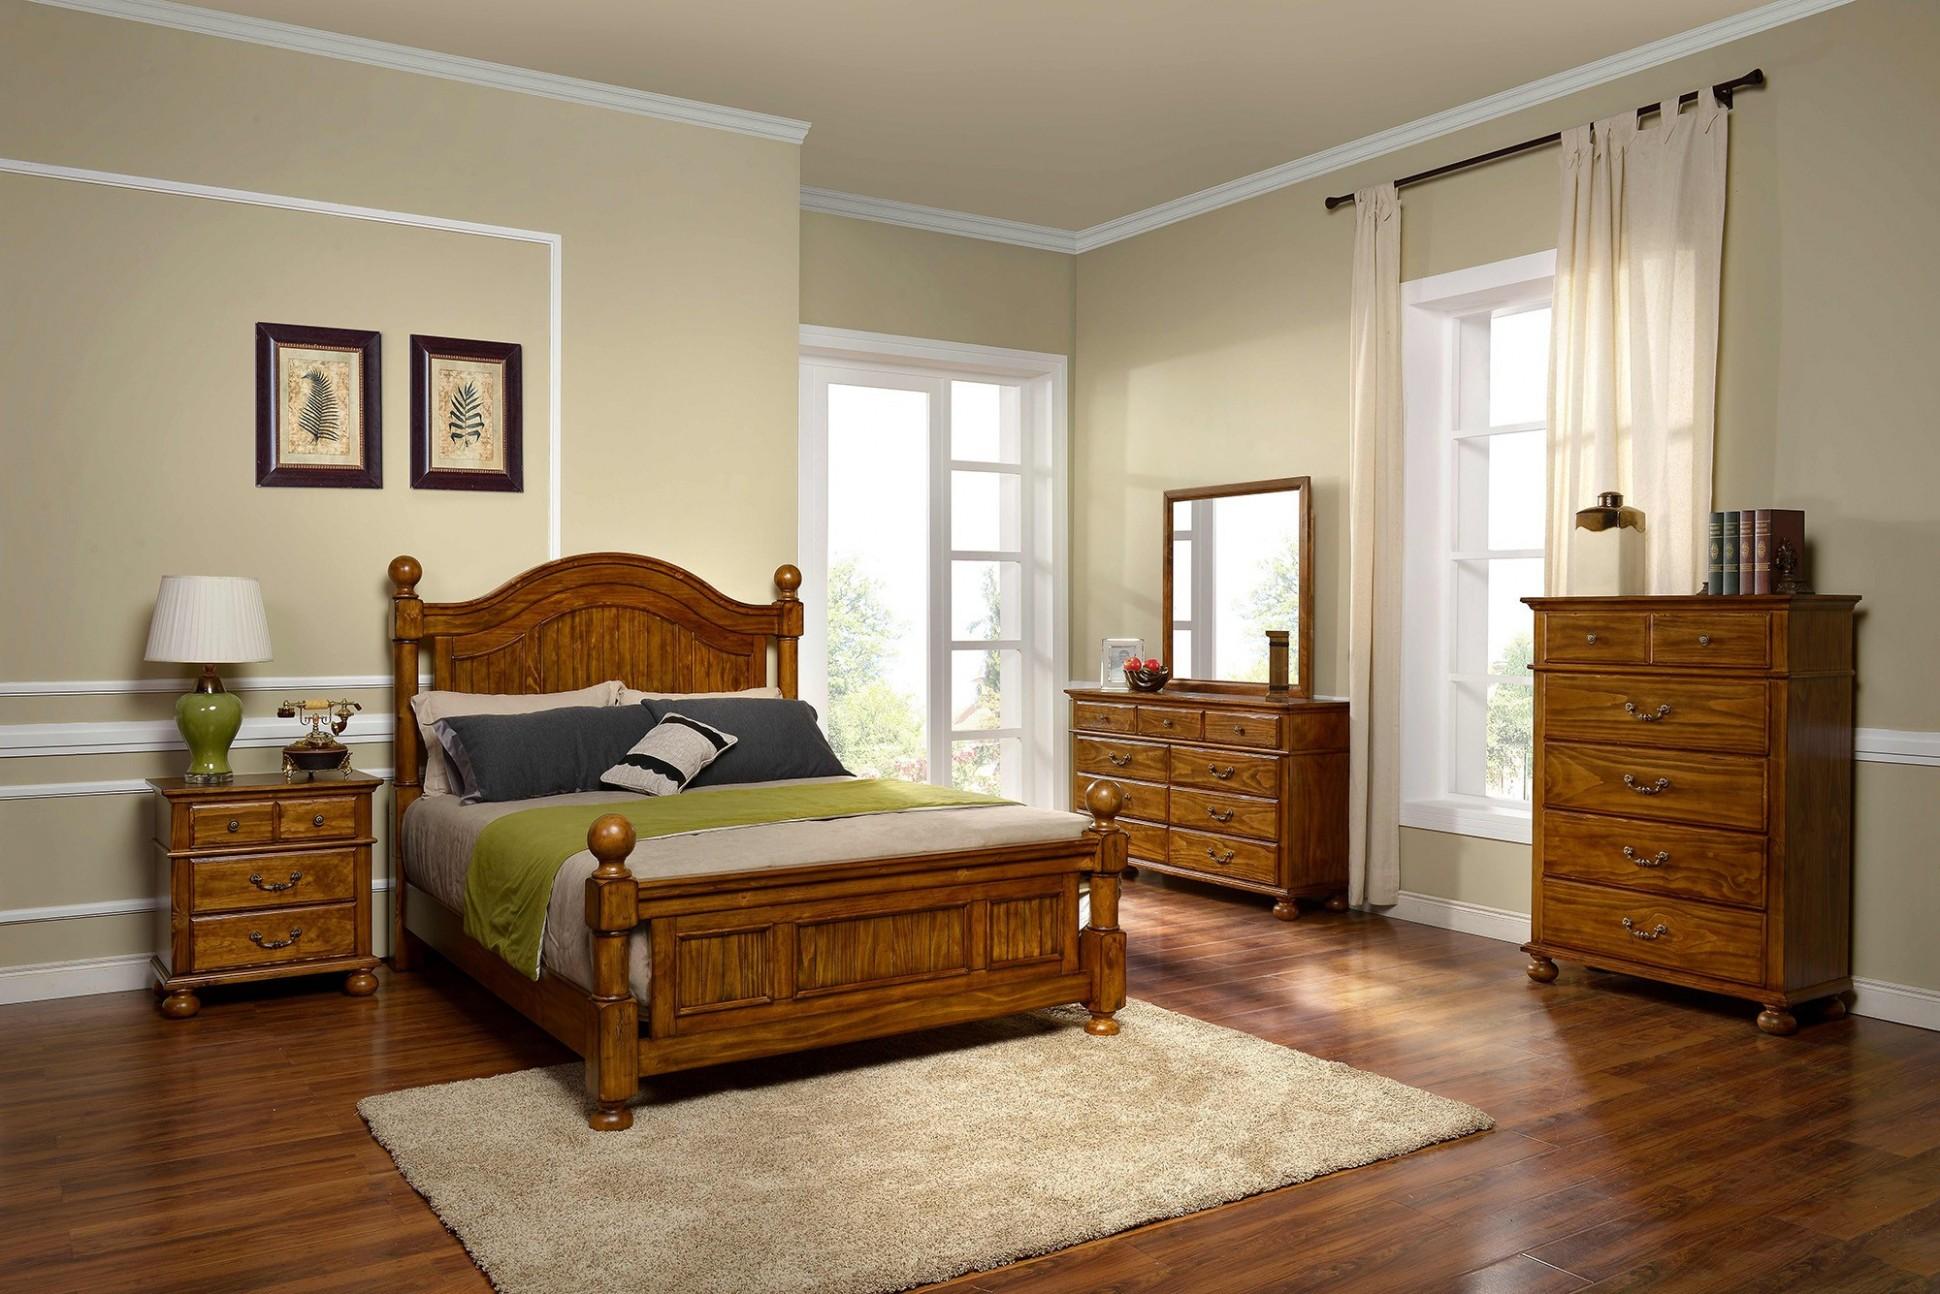 Rustic Wood Bedroom Furniture Light Oak Pine Ideas Sets Natural  - Bedroom Ideas With Oak Furniture